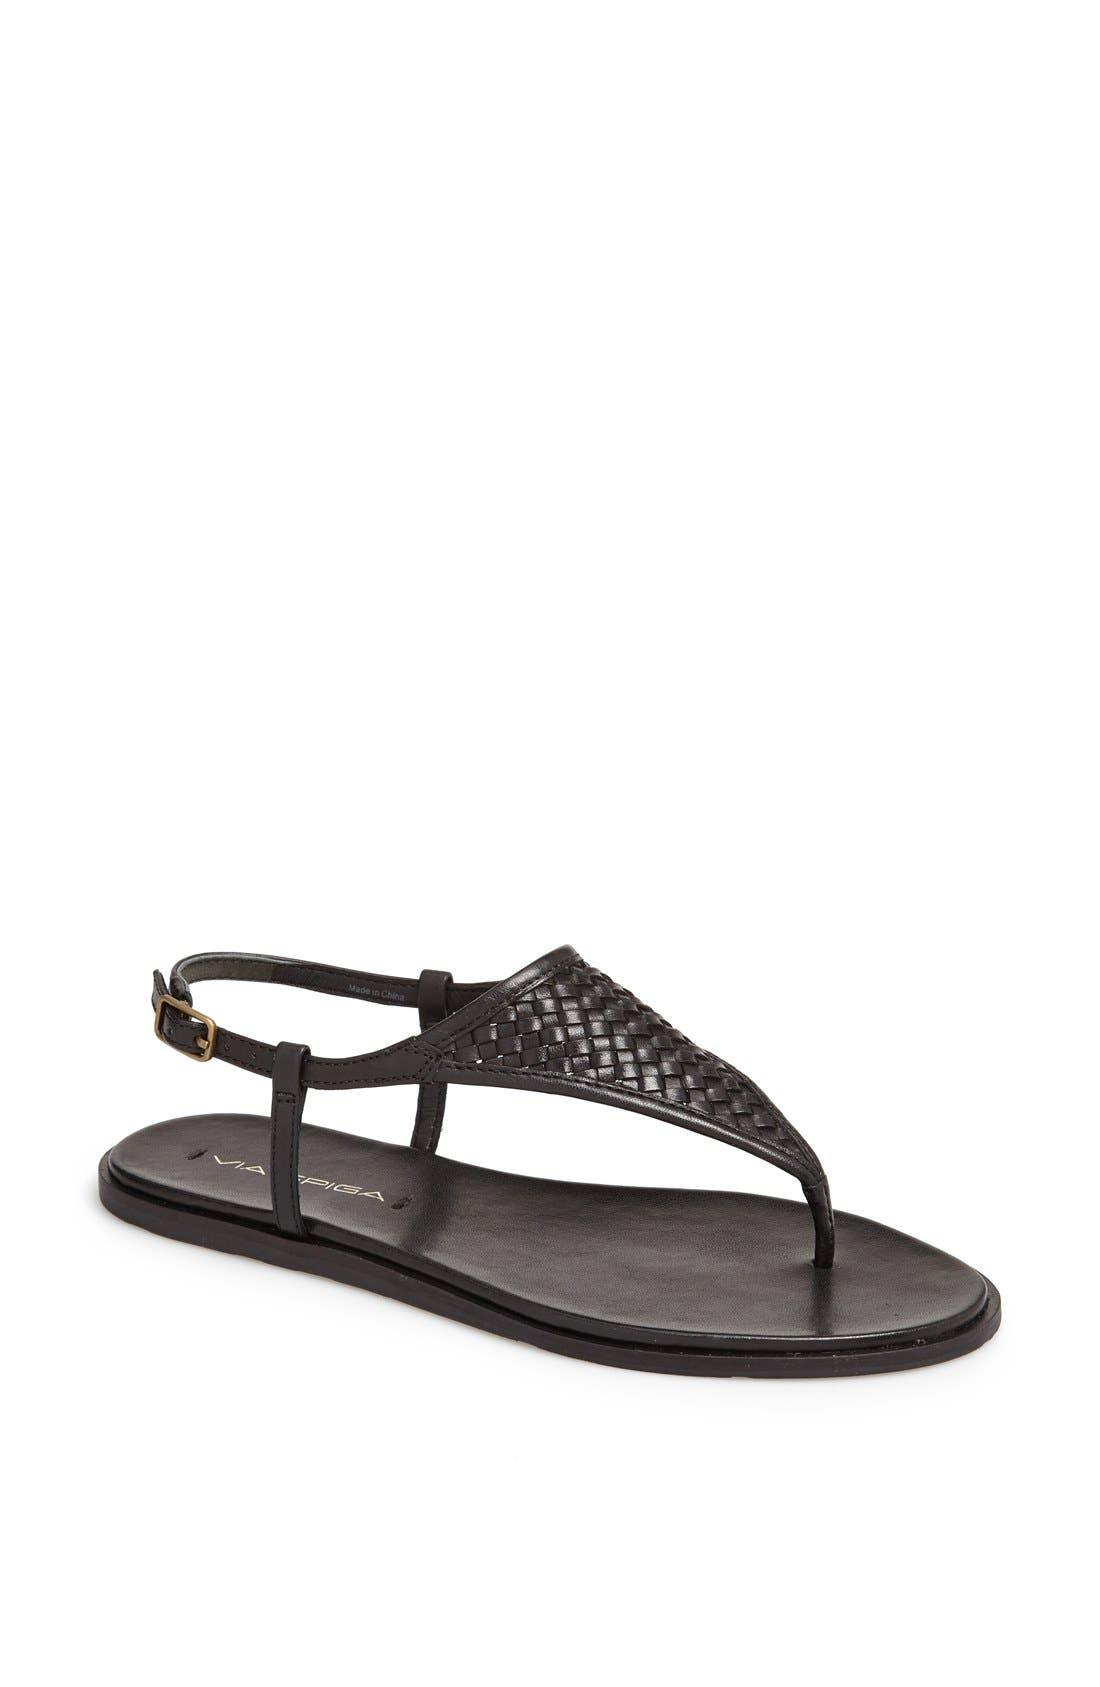 Alternate Image 1 Selected - Via Spiga 'Aislin' Sandal